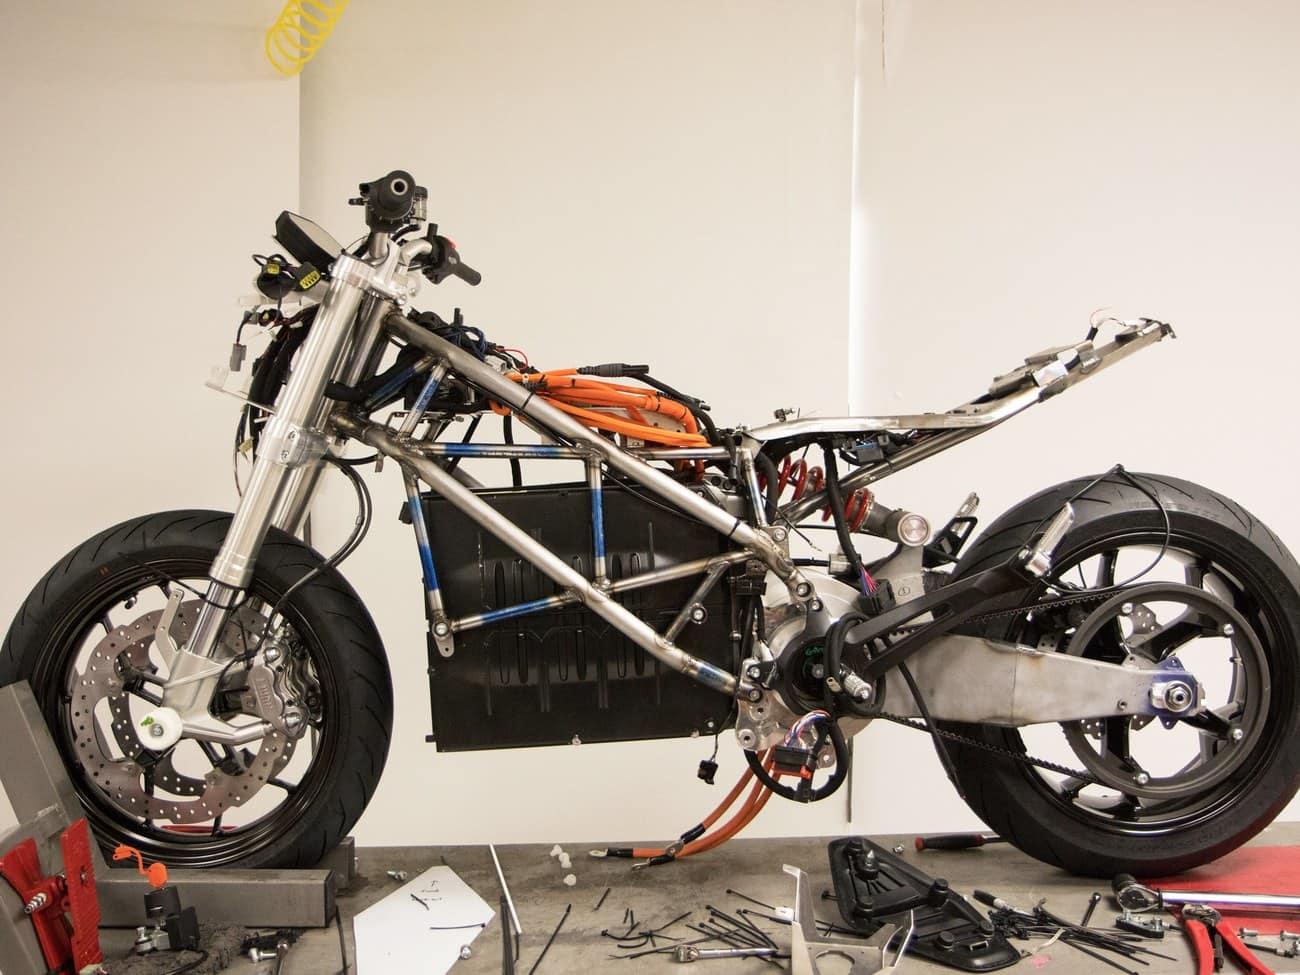 The Trellis exposed frame of the Zero SR/F motorcycle